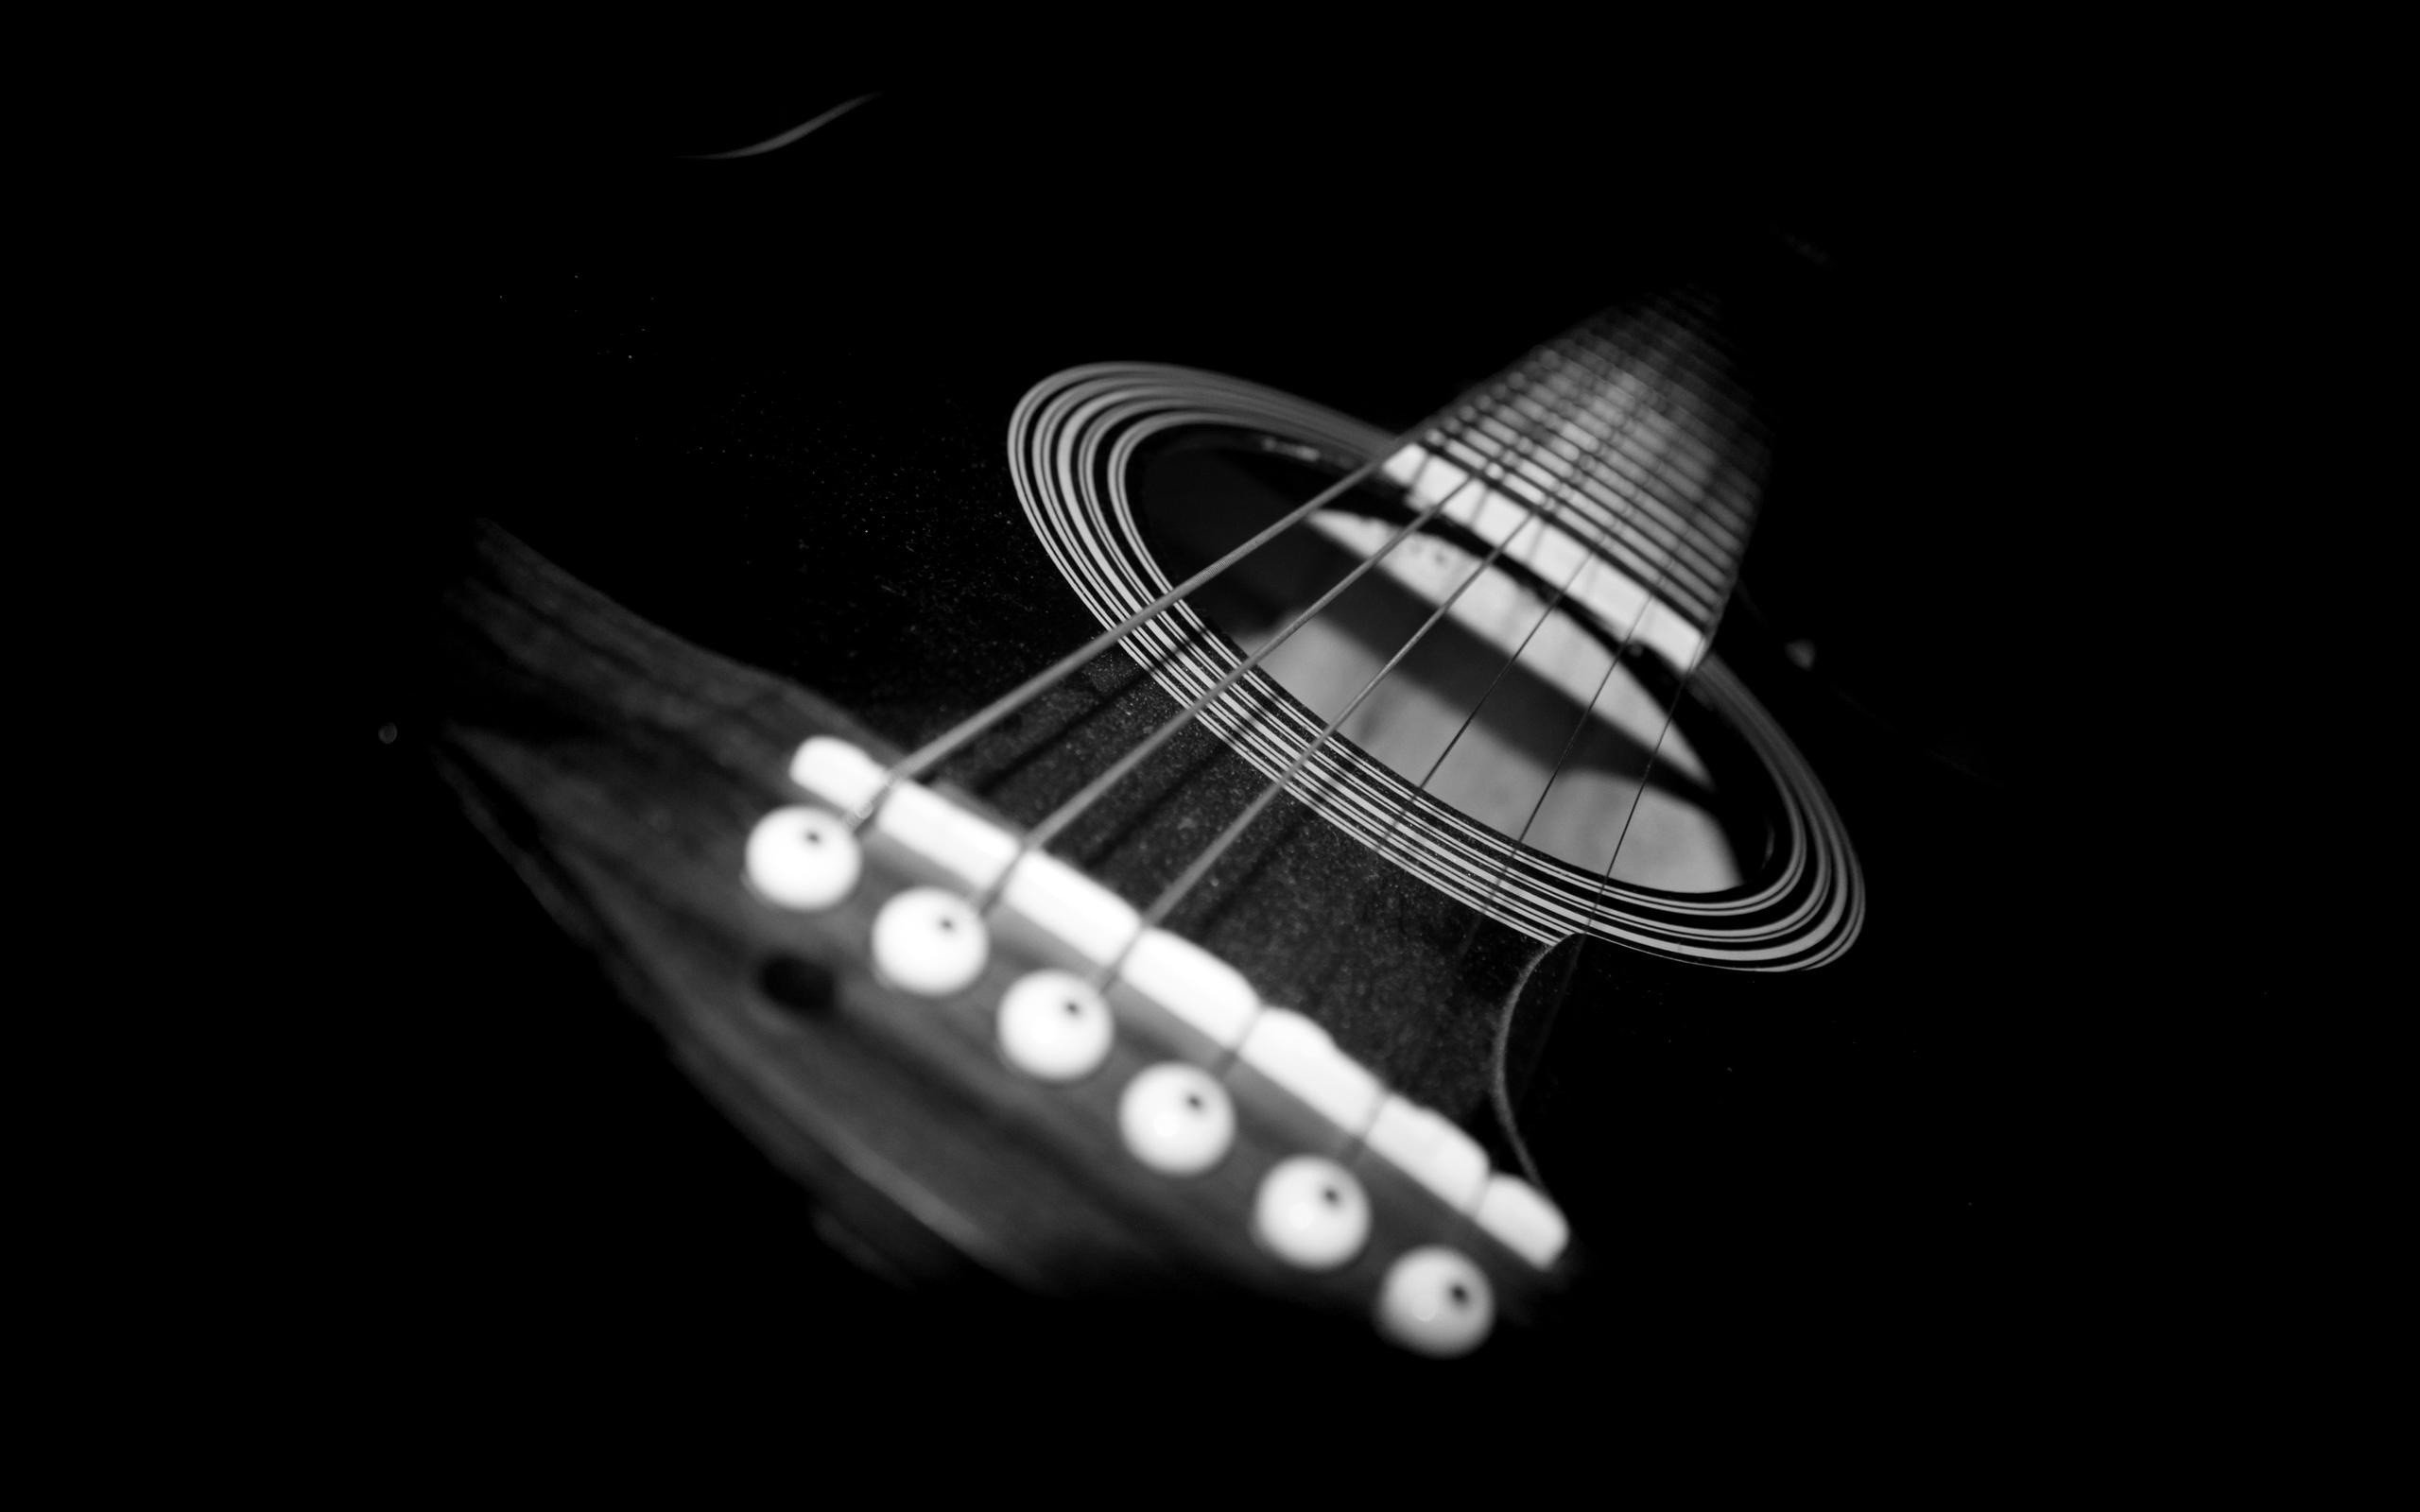 Guitar Wallpapers For Facebook | MixWalls.com | HD Wallpapers | Pinterest |  Hd wallpaper